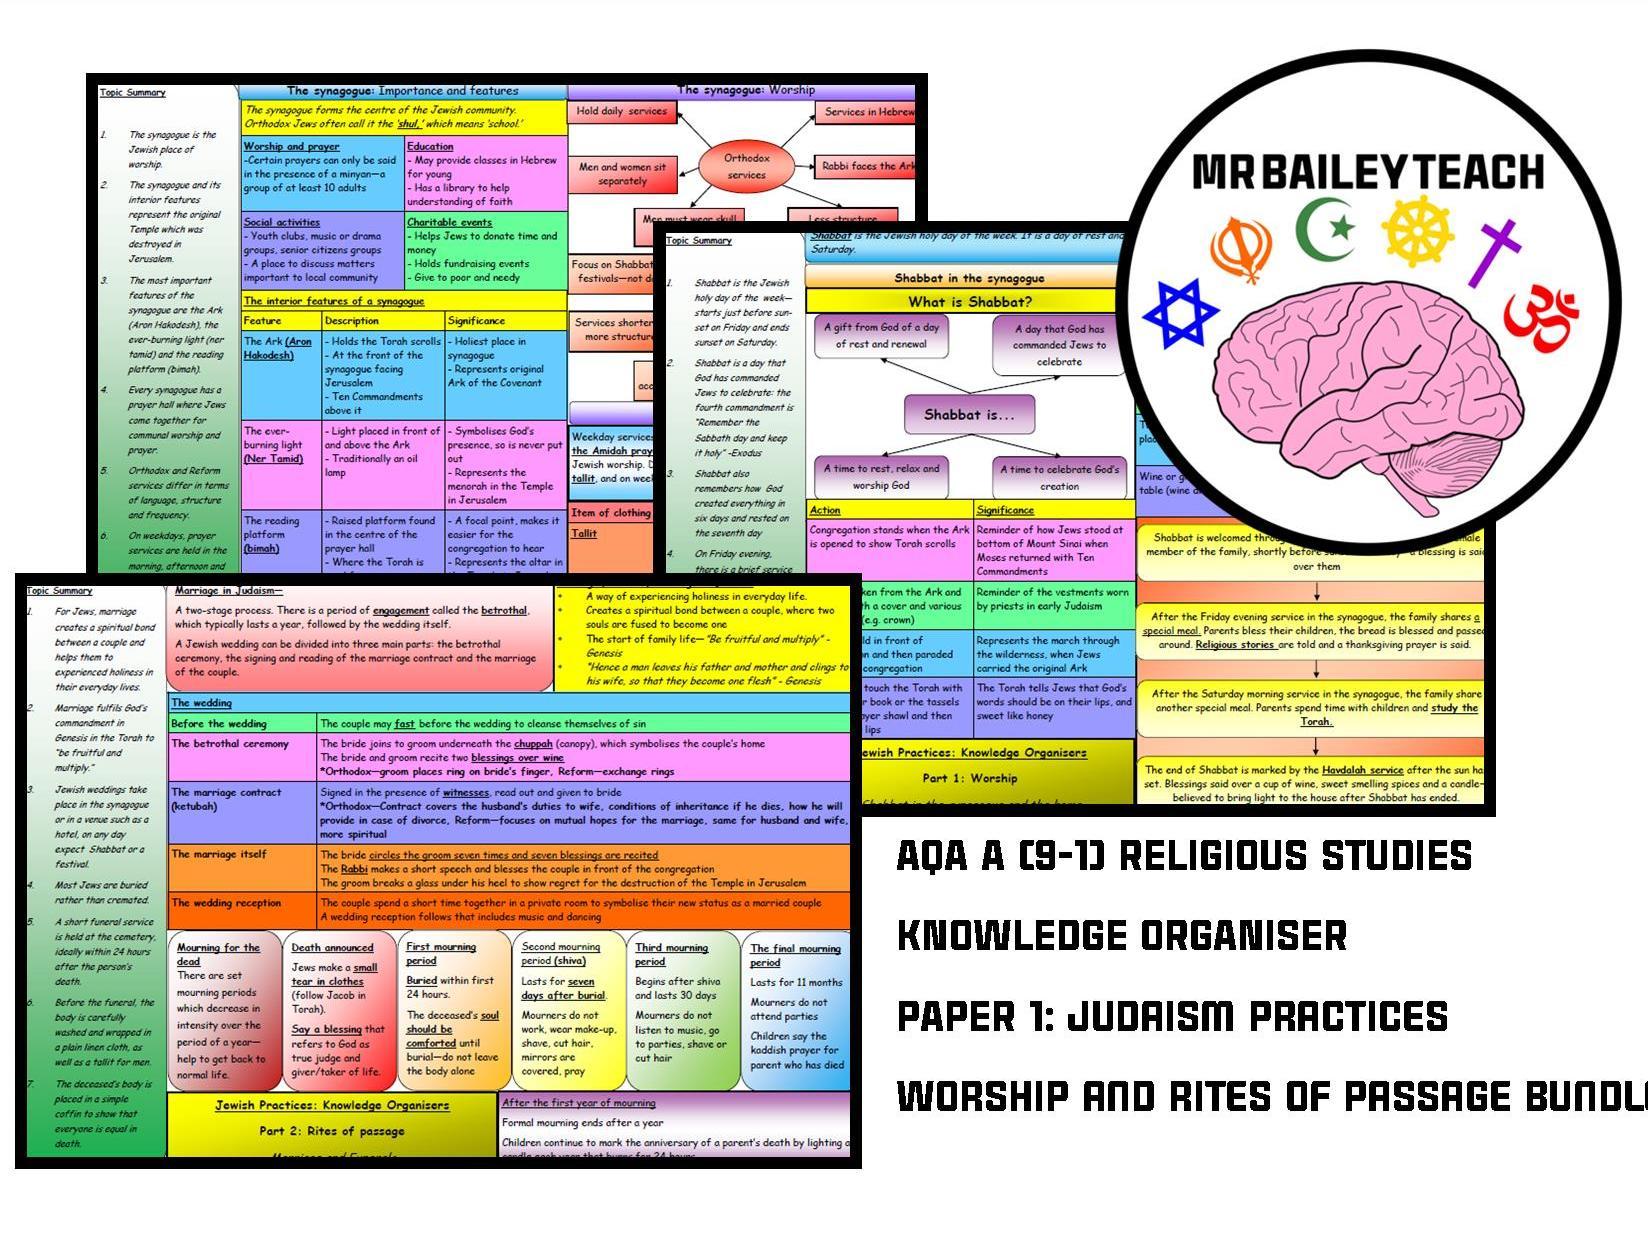 AQA A (9-1) Religious Studies - Judaism Practices: Worship and Rites of Passage Bundle